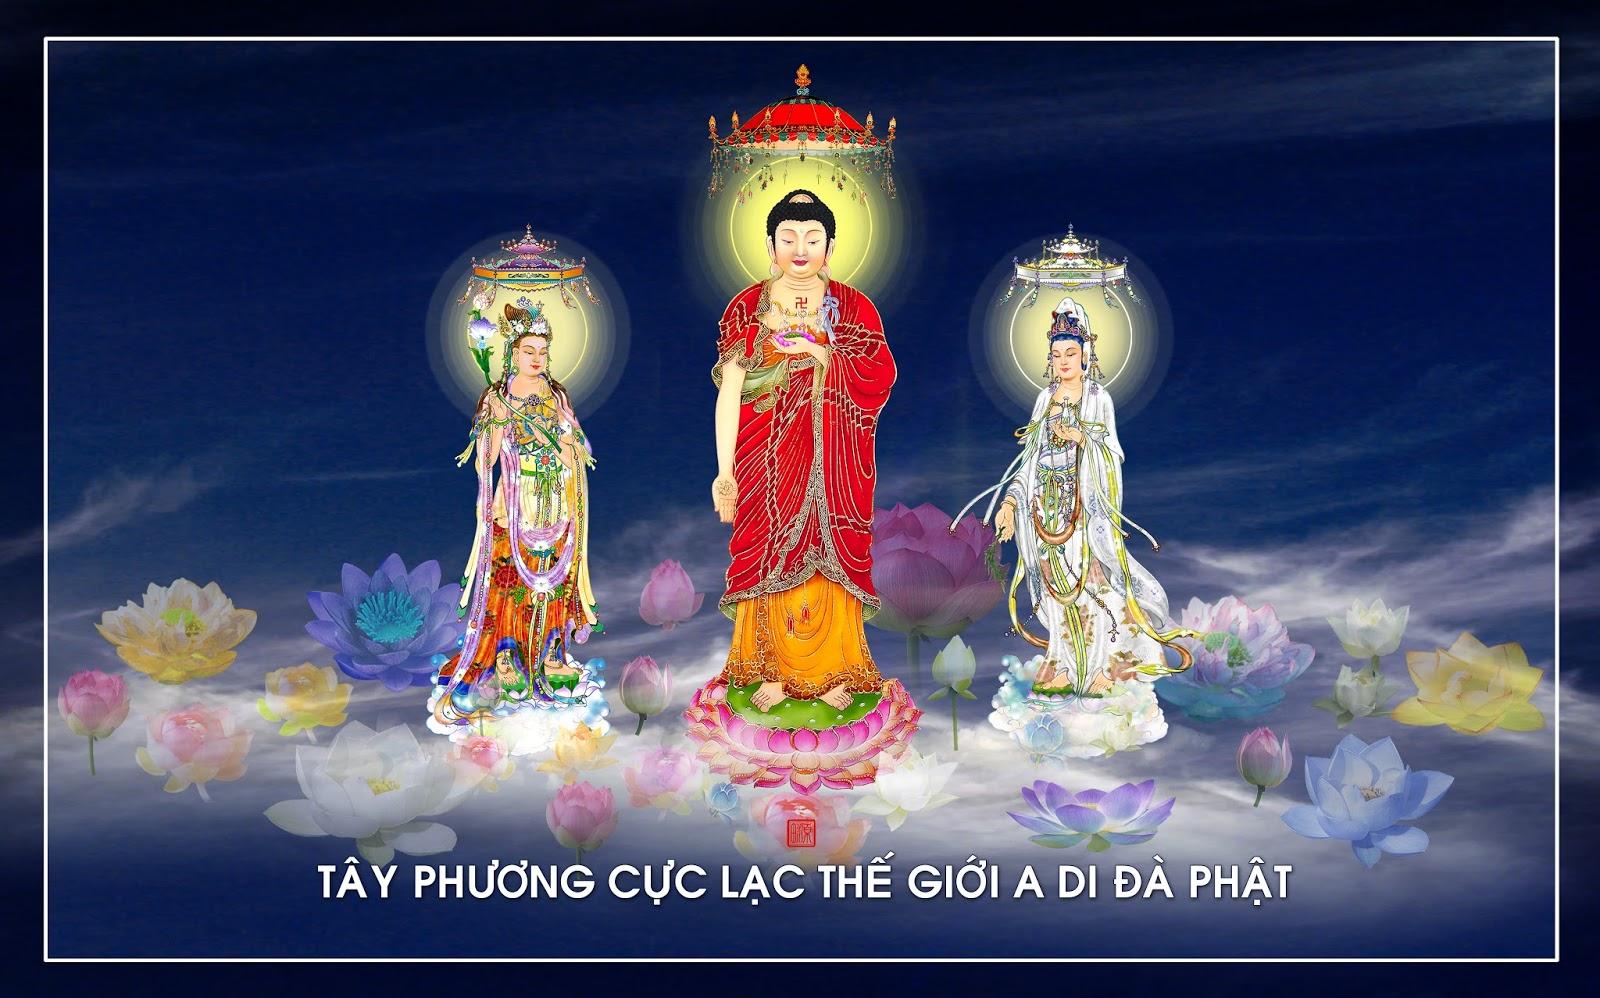 tay-phuong-cuc-lac-tg-14